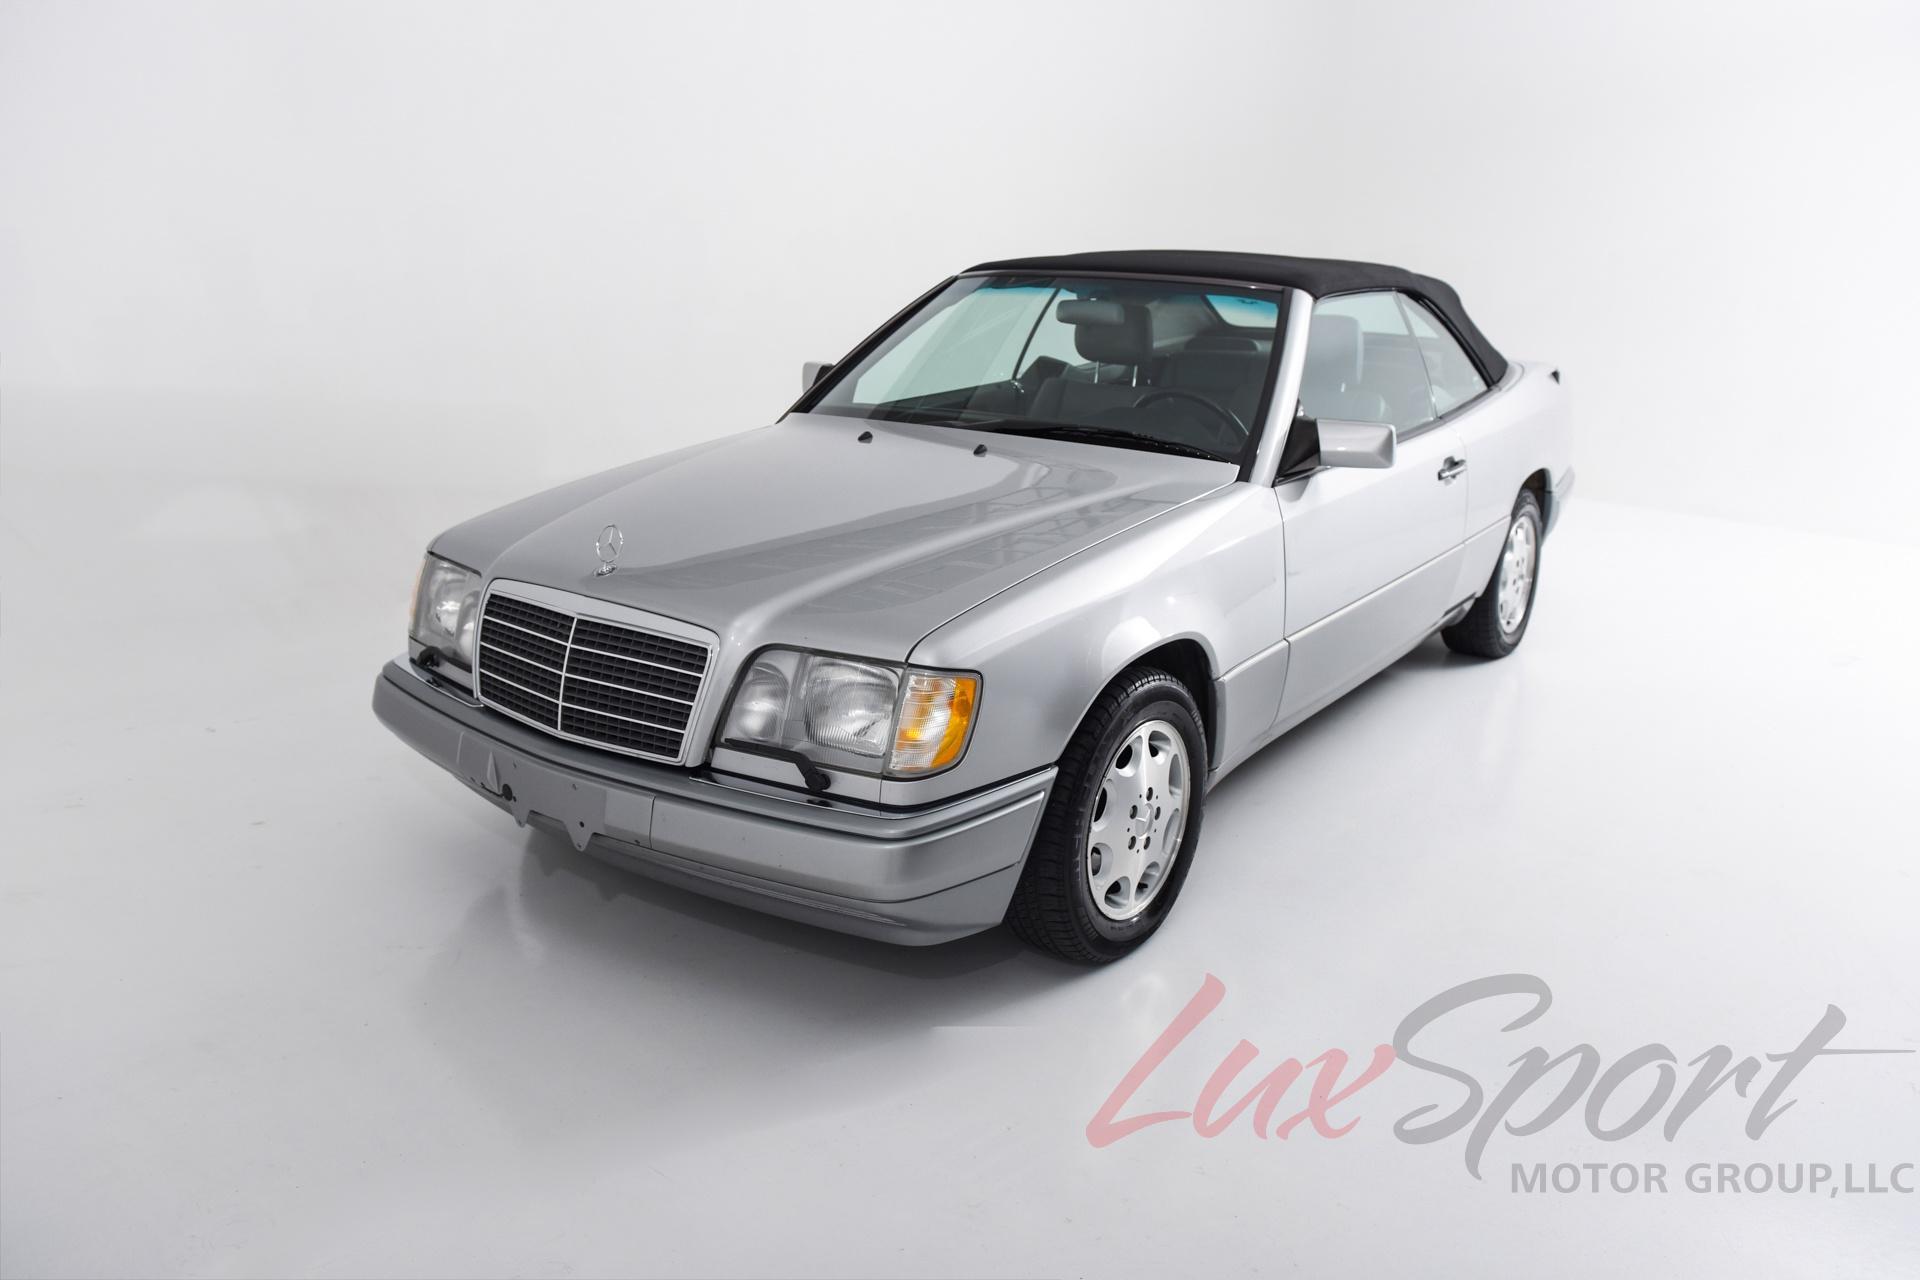 1995 mercedes benz e320 cabriolet e320 stock 1995110 for for Nearest mercedes benz